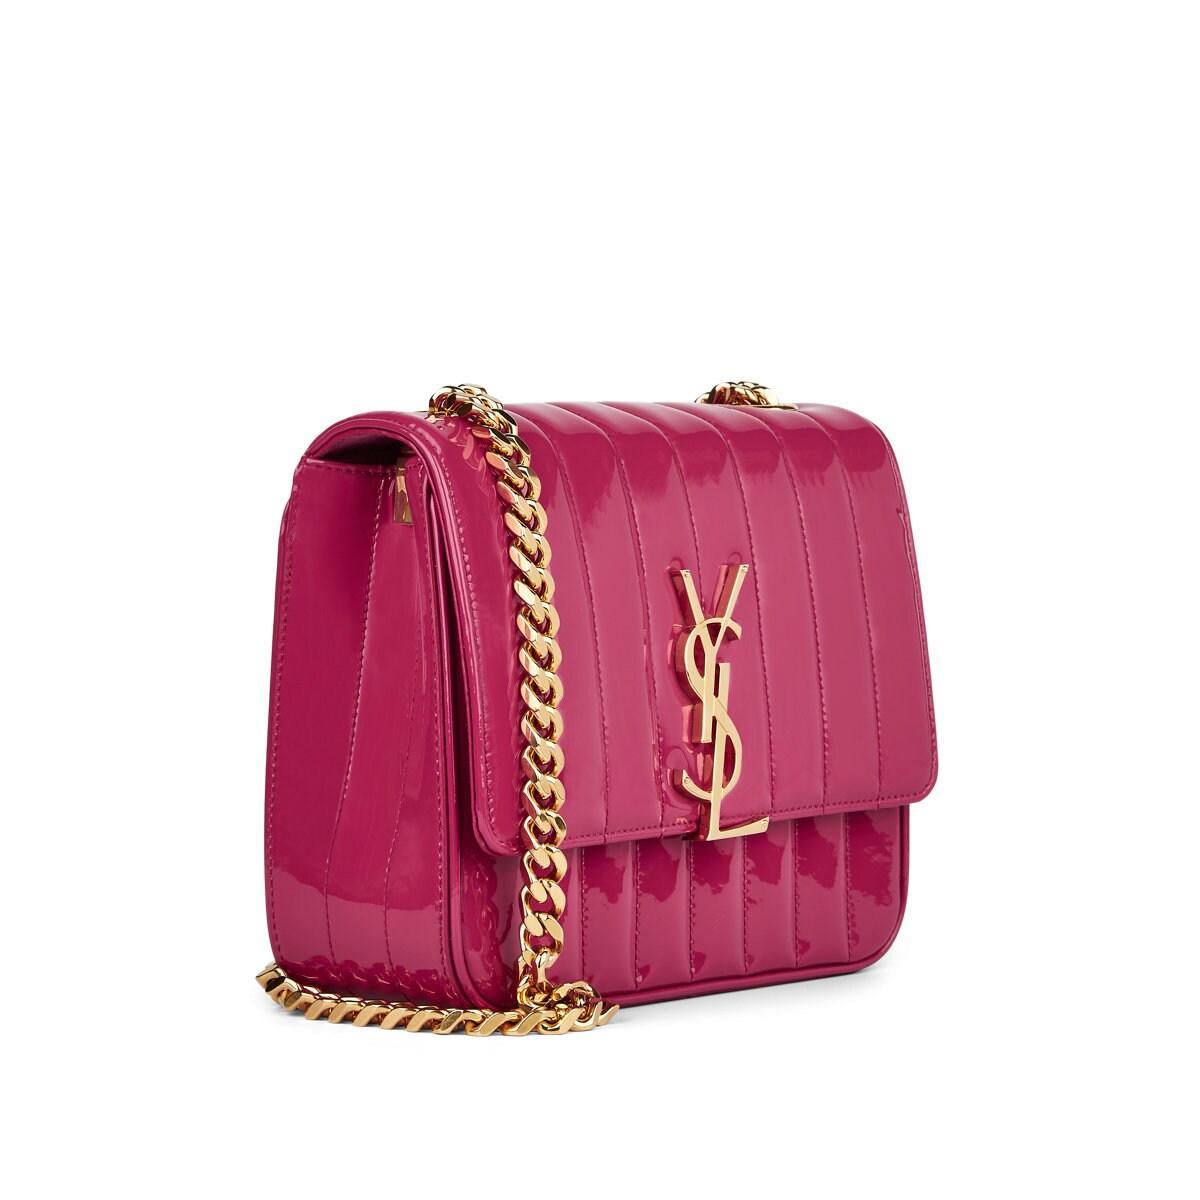 c5207d1f791 Saint Laurent - Pink Monogram Vicky Medium Leather Chain Bag - Lyst. View  fullscreen